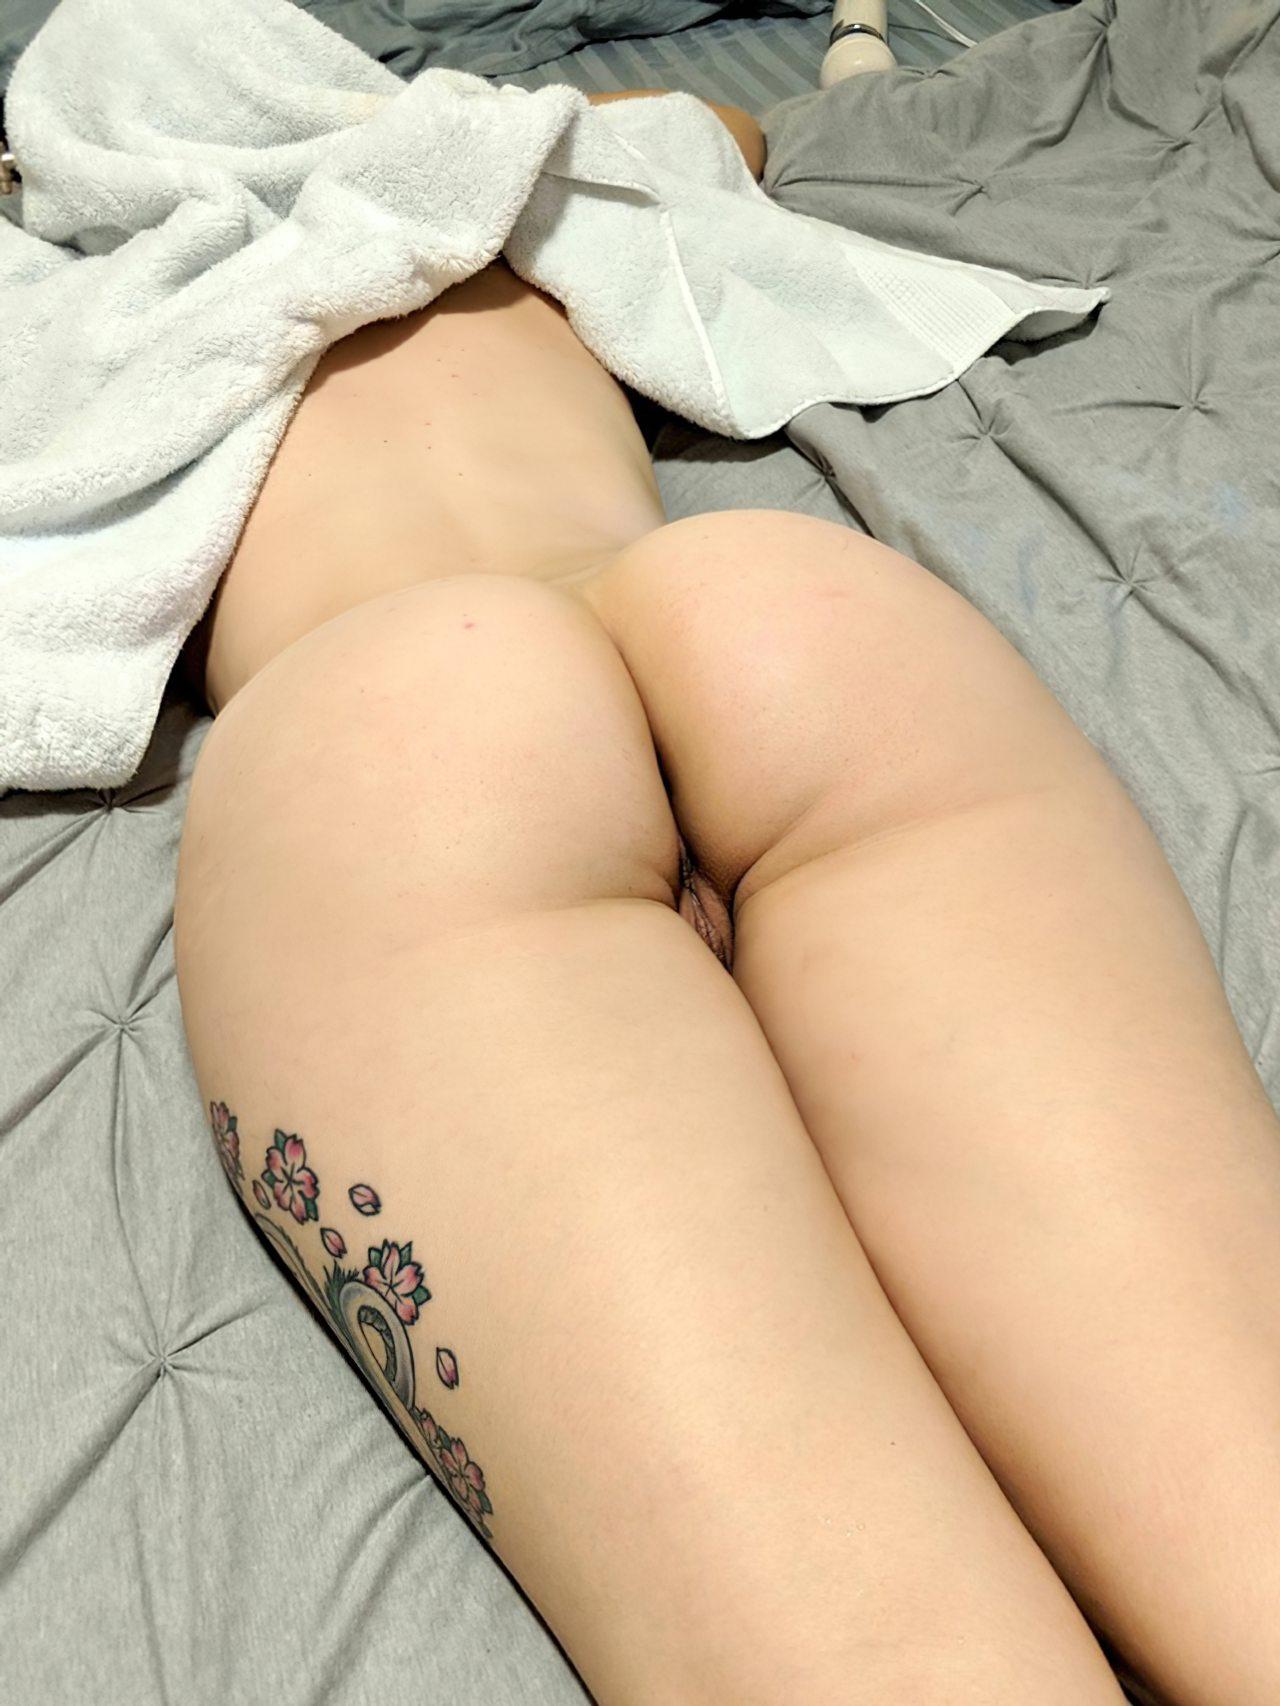 Fotos Sexo Nudes Loira Anonima (9)